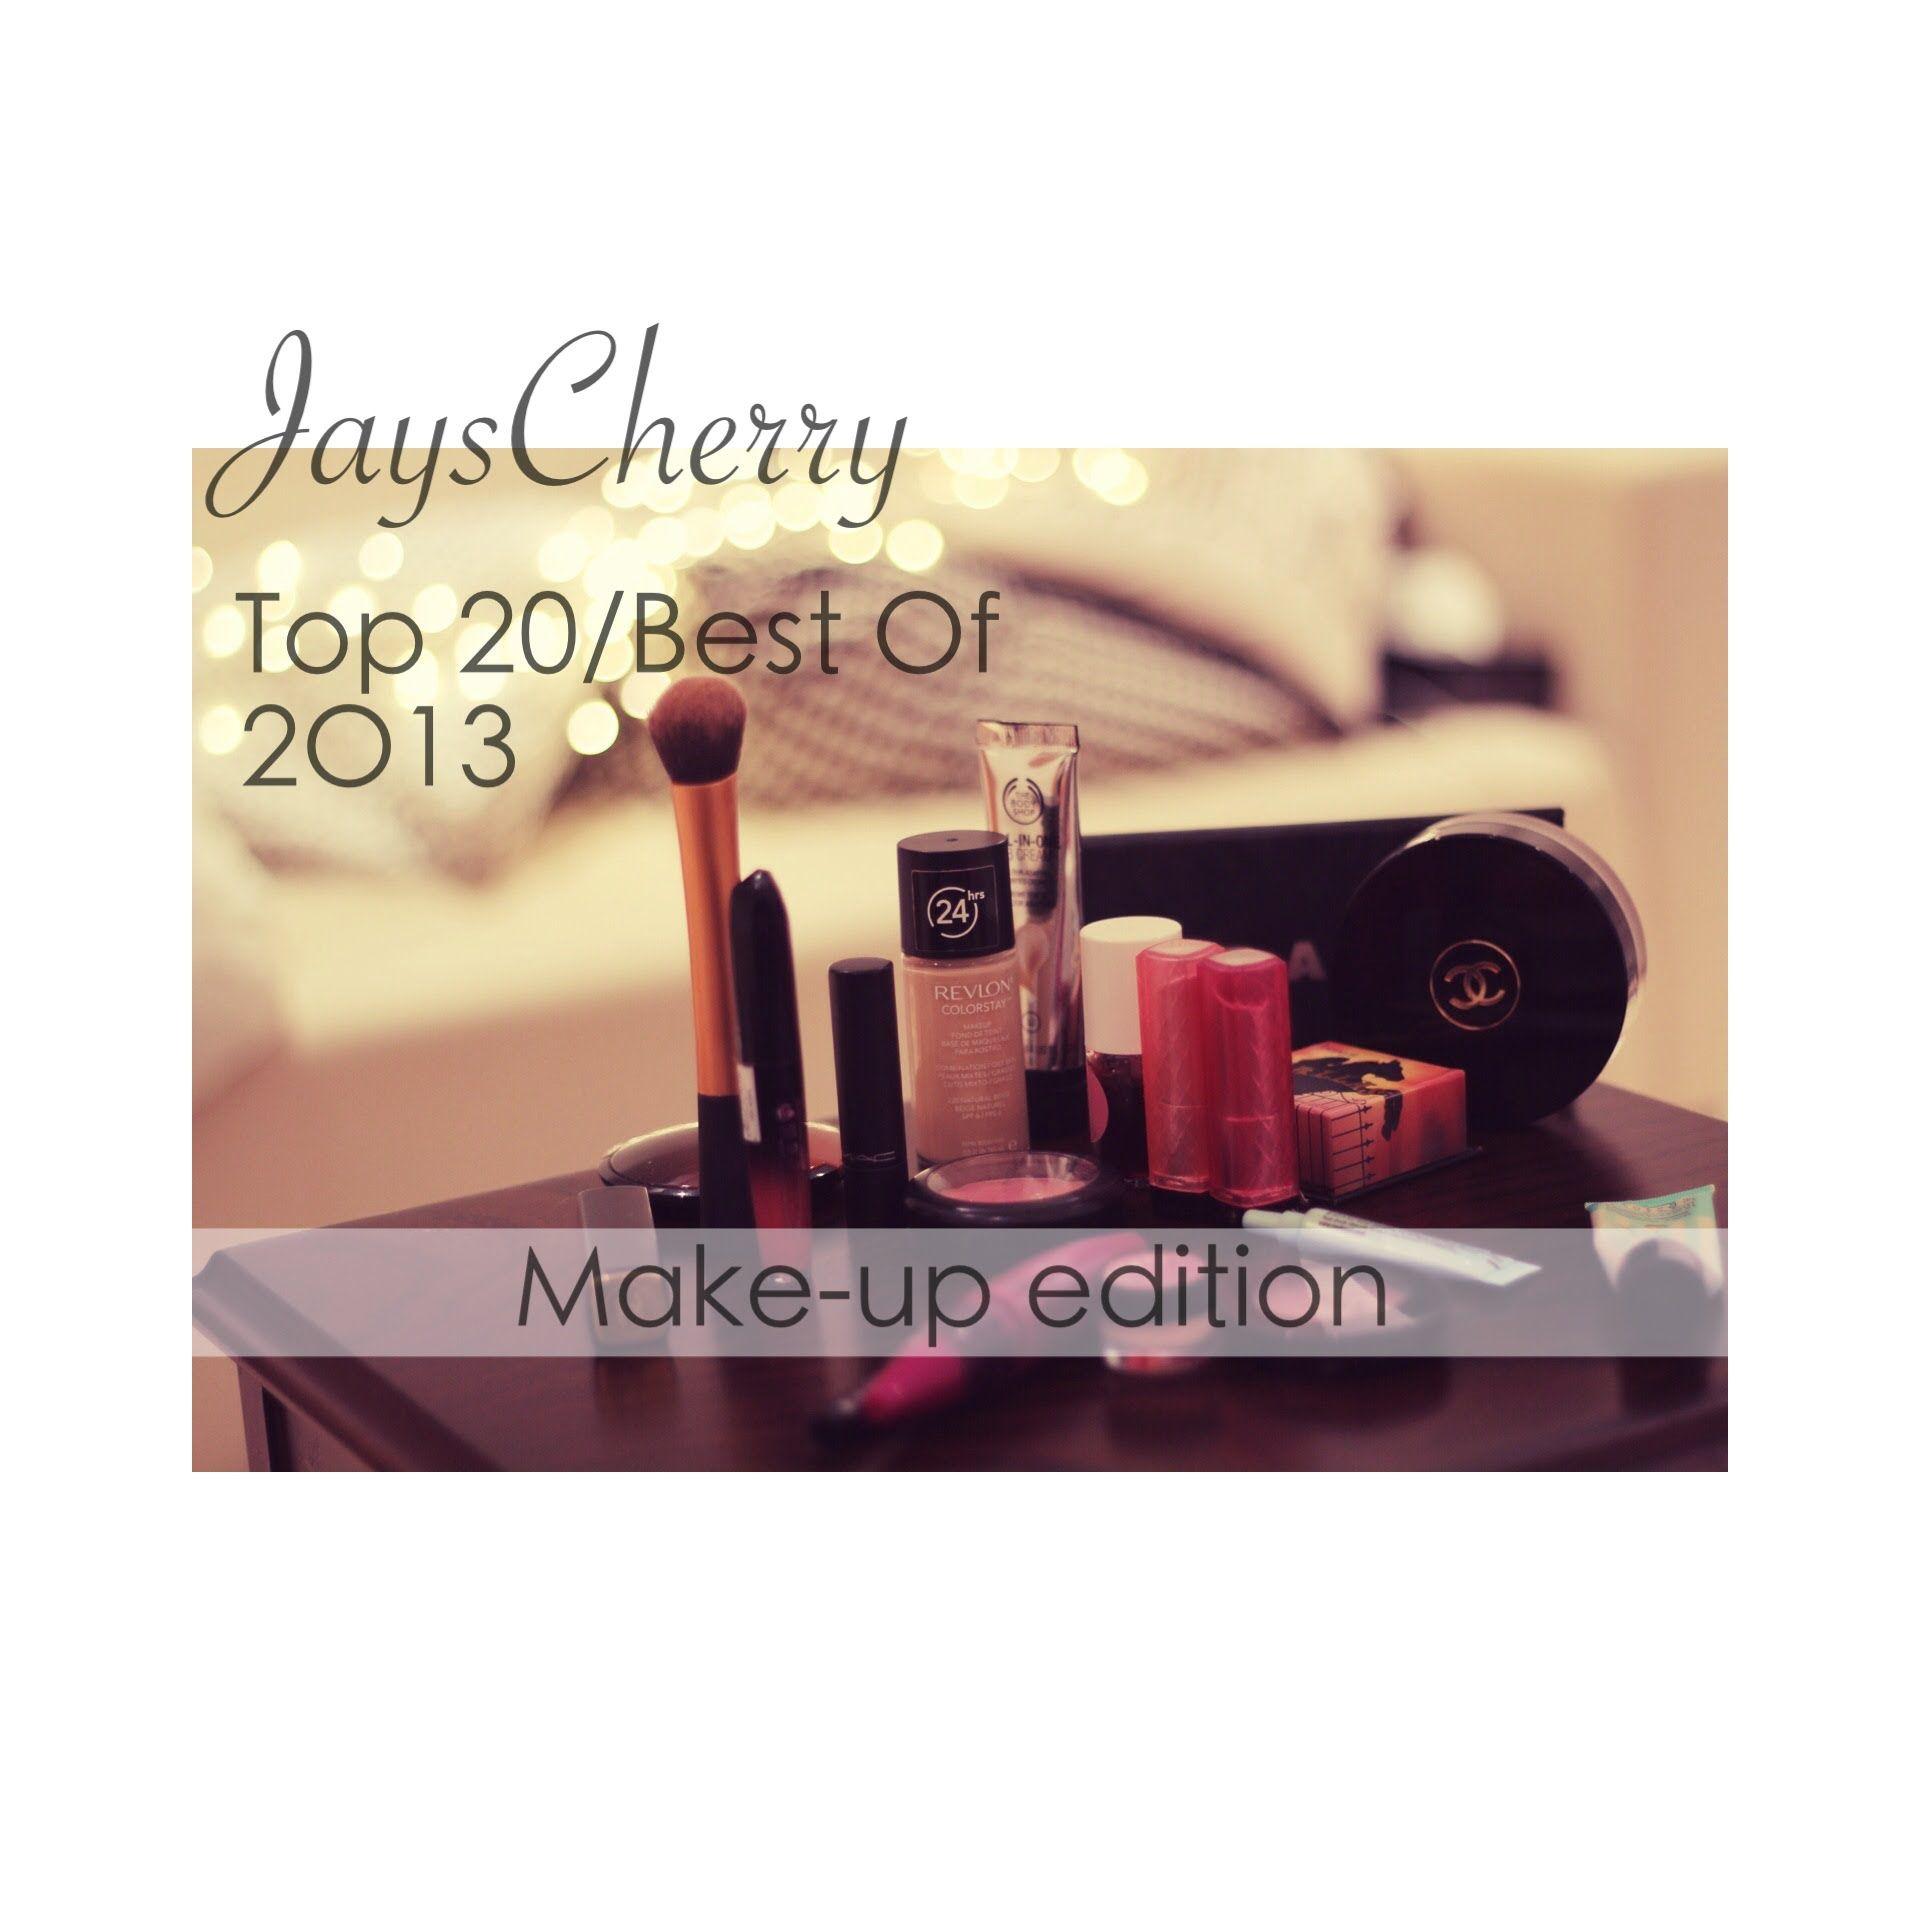 Best Of 2o13 Make Up افضل 20 منتج حبيتهم Cherry On Top Make Up How To Make